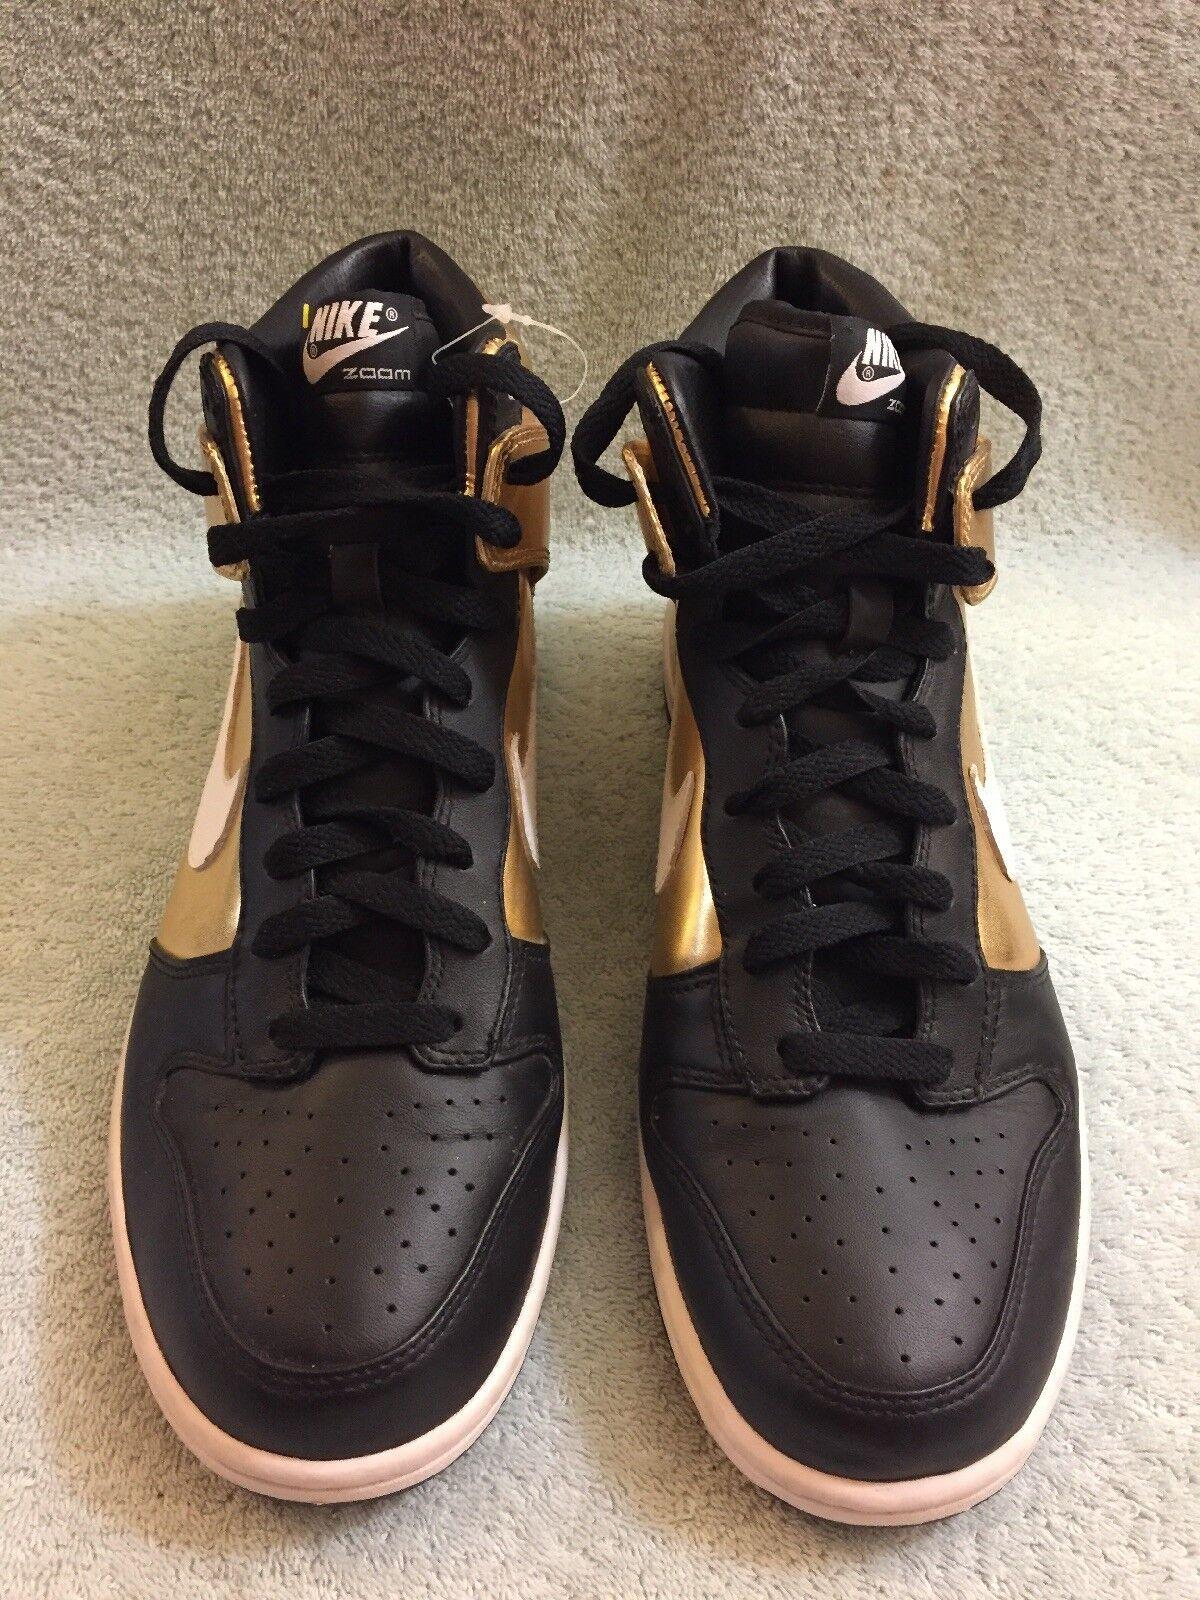 Nike Zoom Dunk 2007 DS Black   HIGH PREMIUM Black gold 317892-711 Men's Sz 10